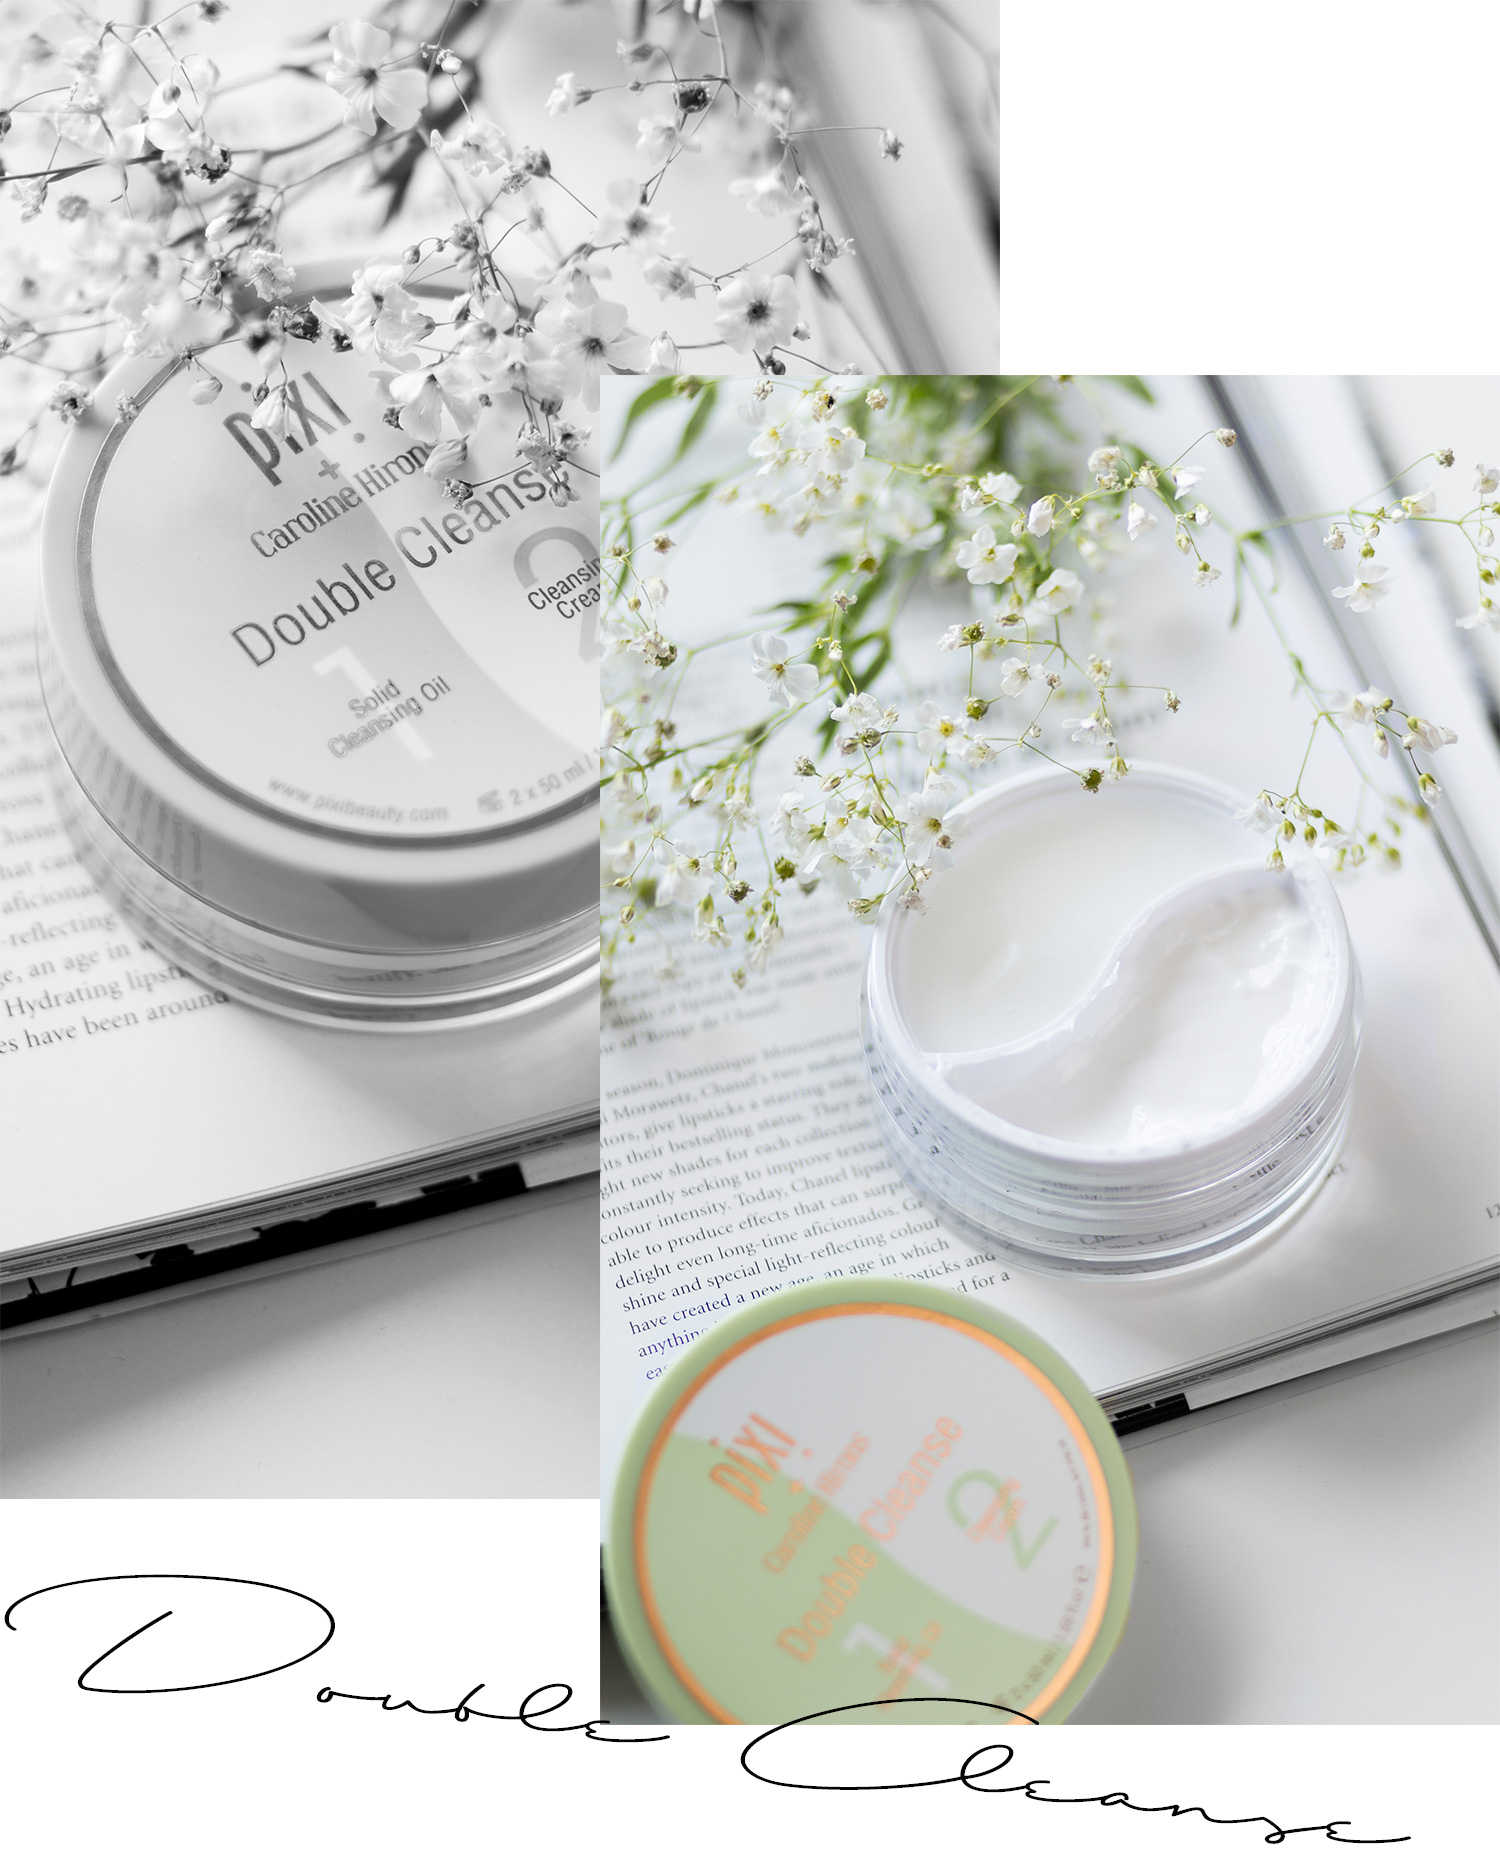 Neuheiten von Pixi, Double Cleanse Erfahrung, Hautpflege im Test, strahlende Haut im Sommer, Review, Skincare, Beauty, bezauberndenana.de